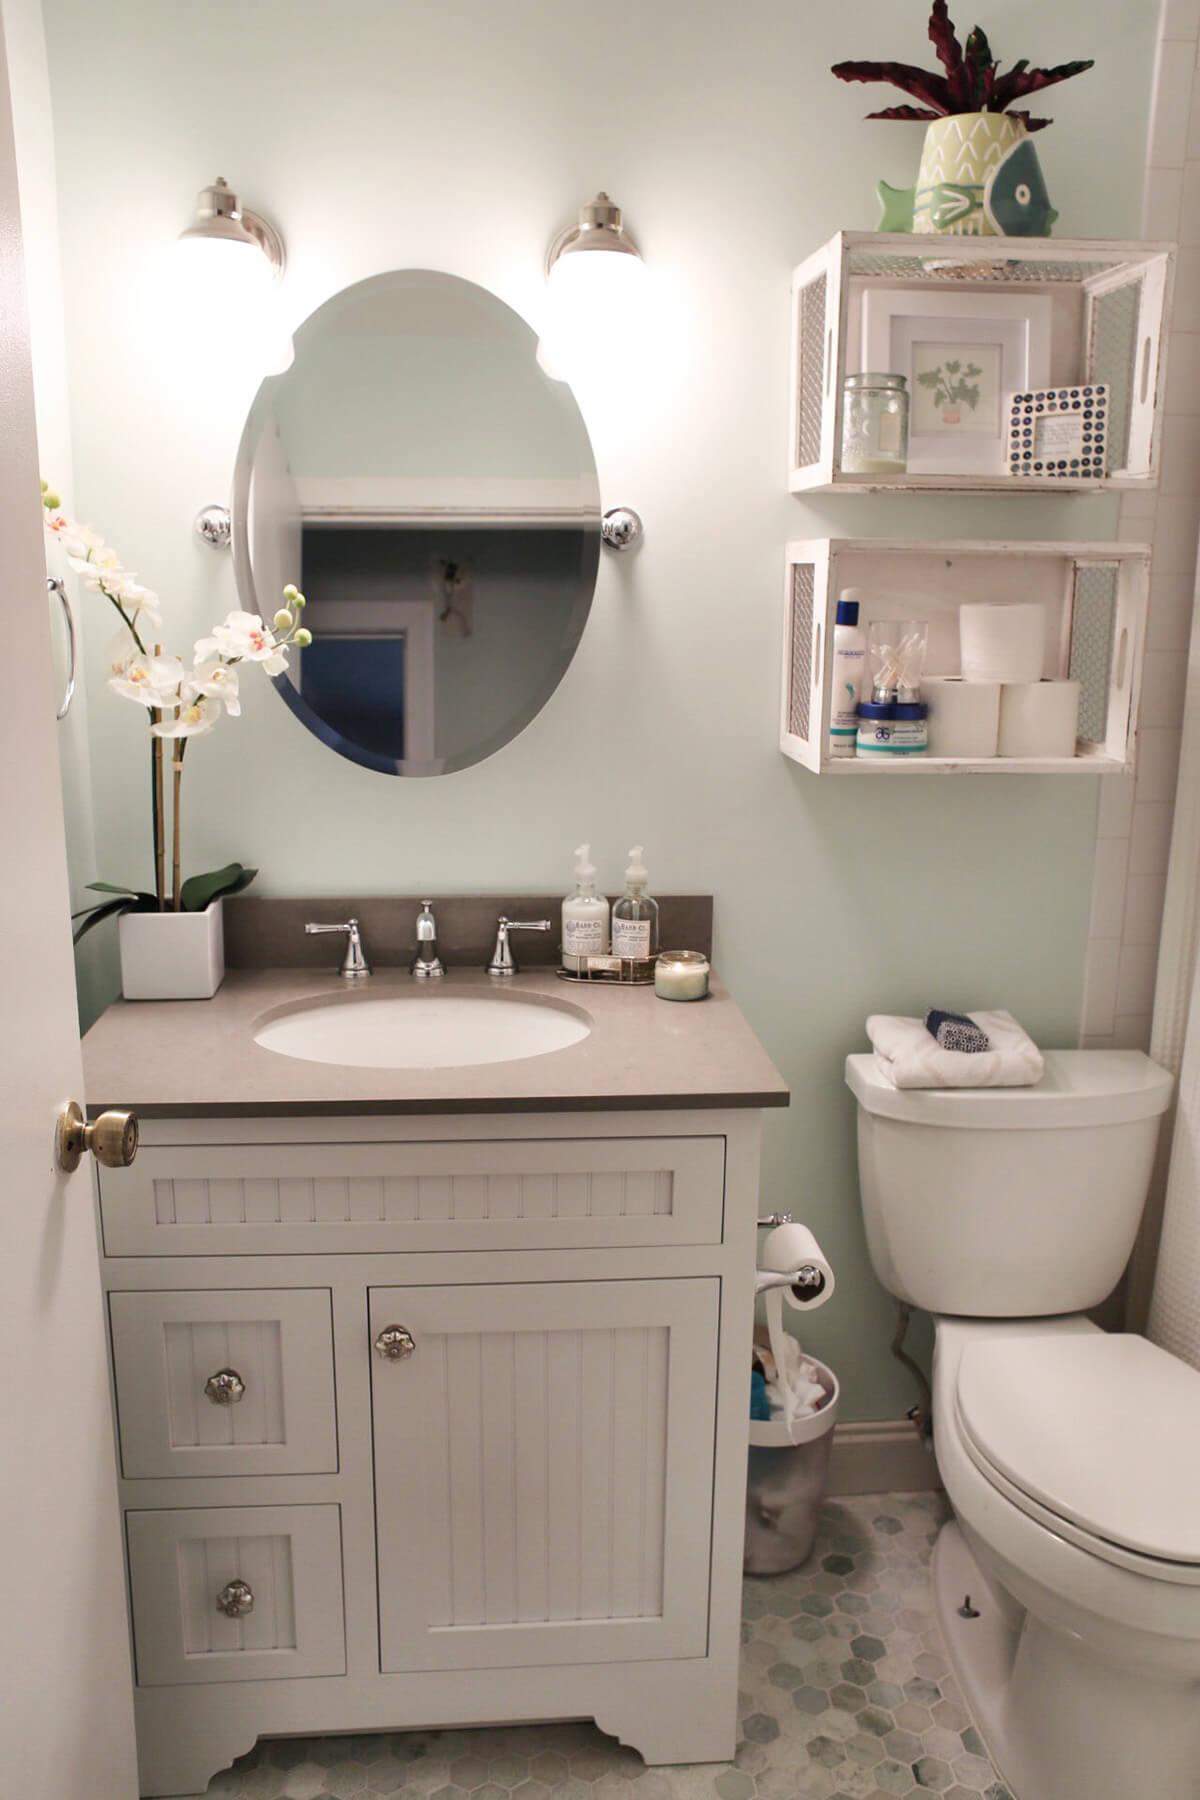 Fullsize Of Over The Toilet Storage